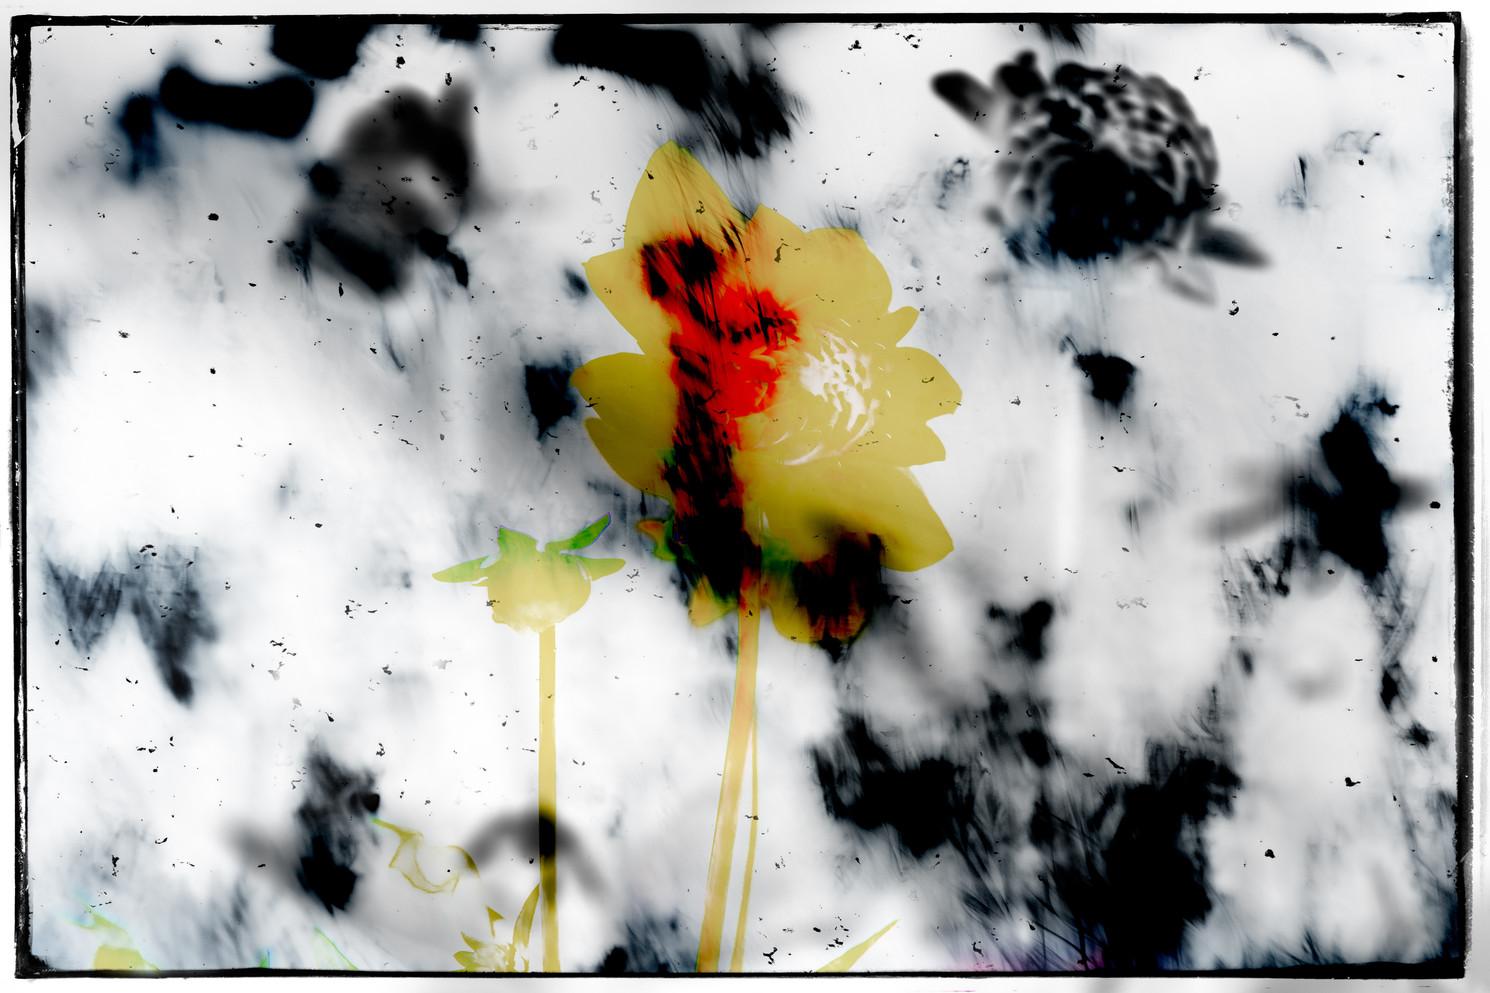 The Garden of Persephone 013